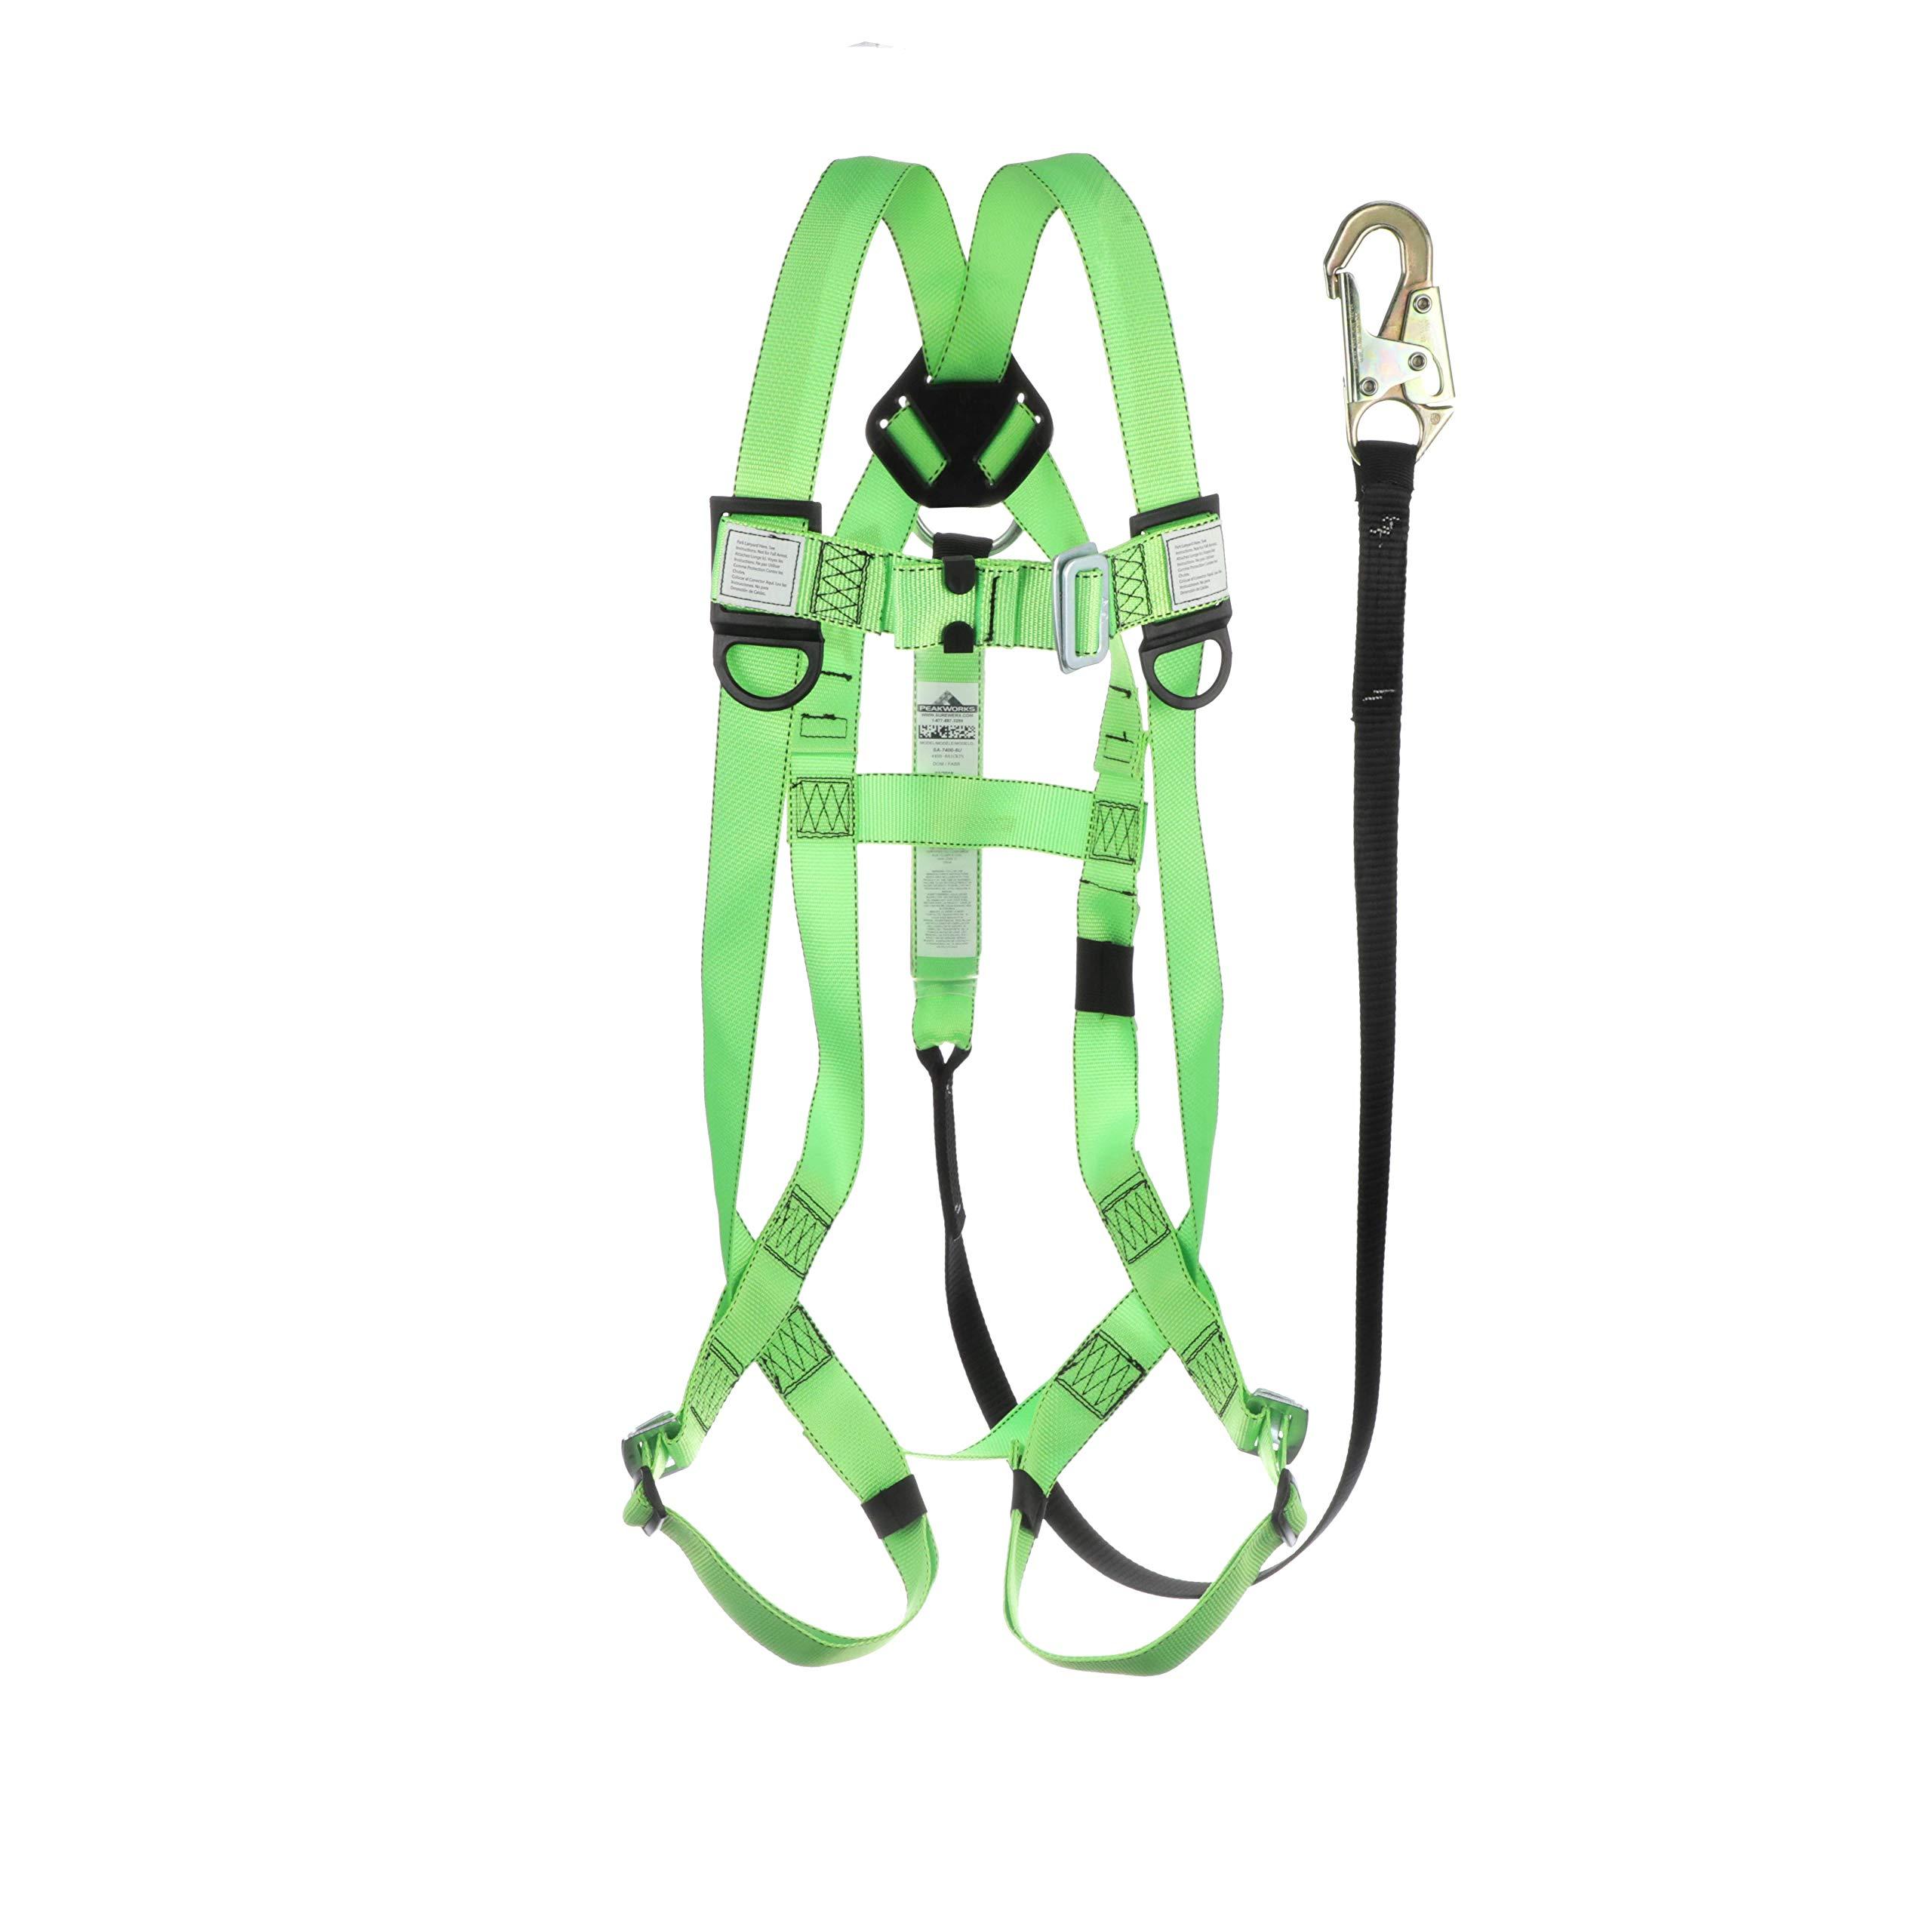 Peakworks Fall Protection V8252366 OSHA/ANSI Compliant Safety Harness and 6 ft. Lanyard Kit